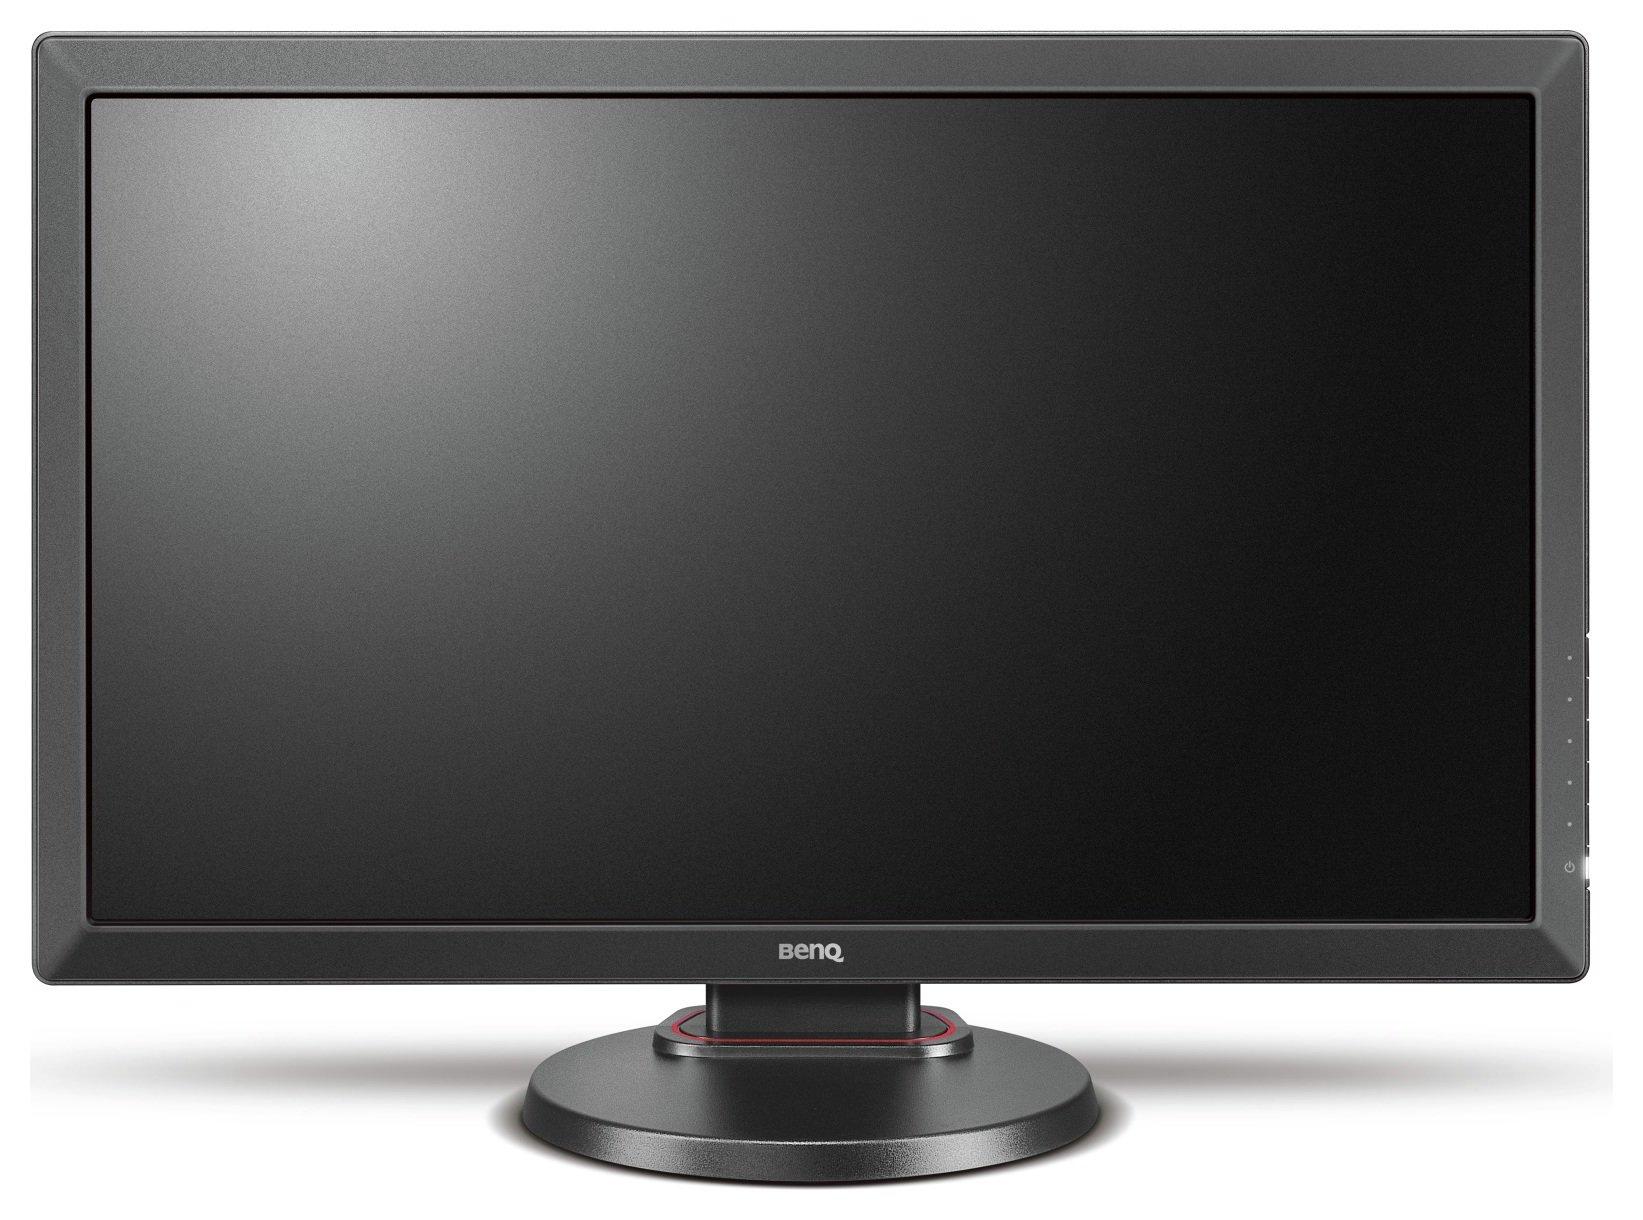 BenQ Zowie RL2460 24 Inch Gaming PC Monitor.